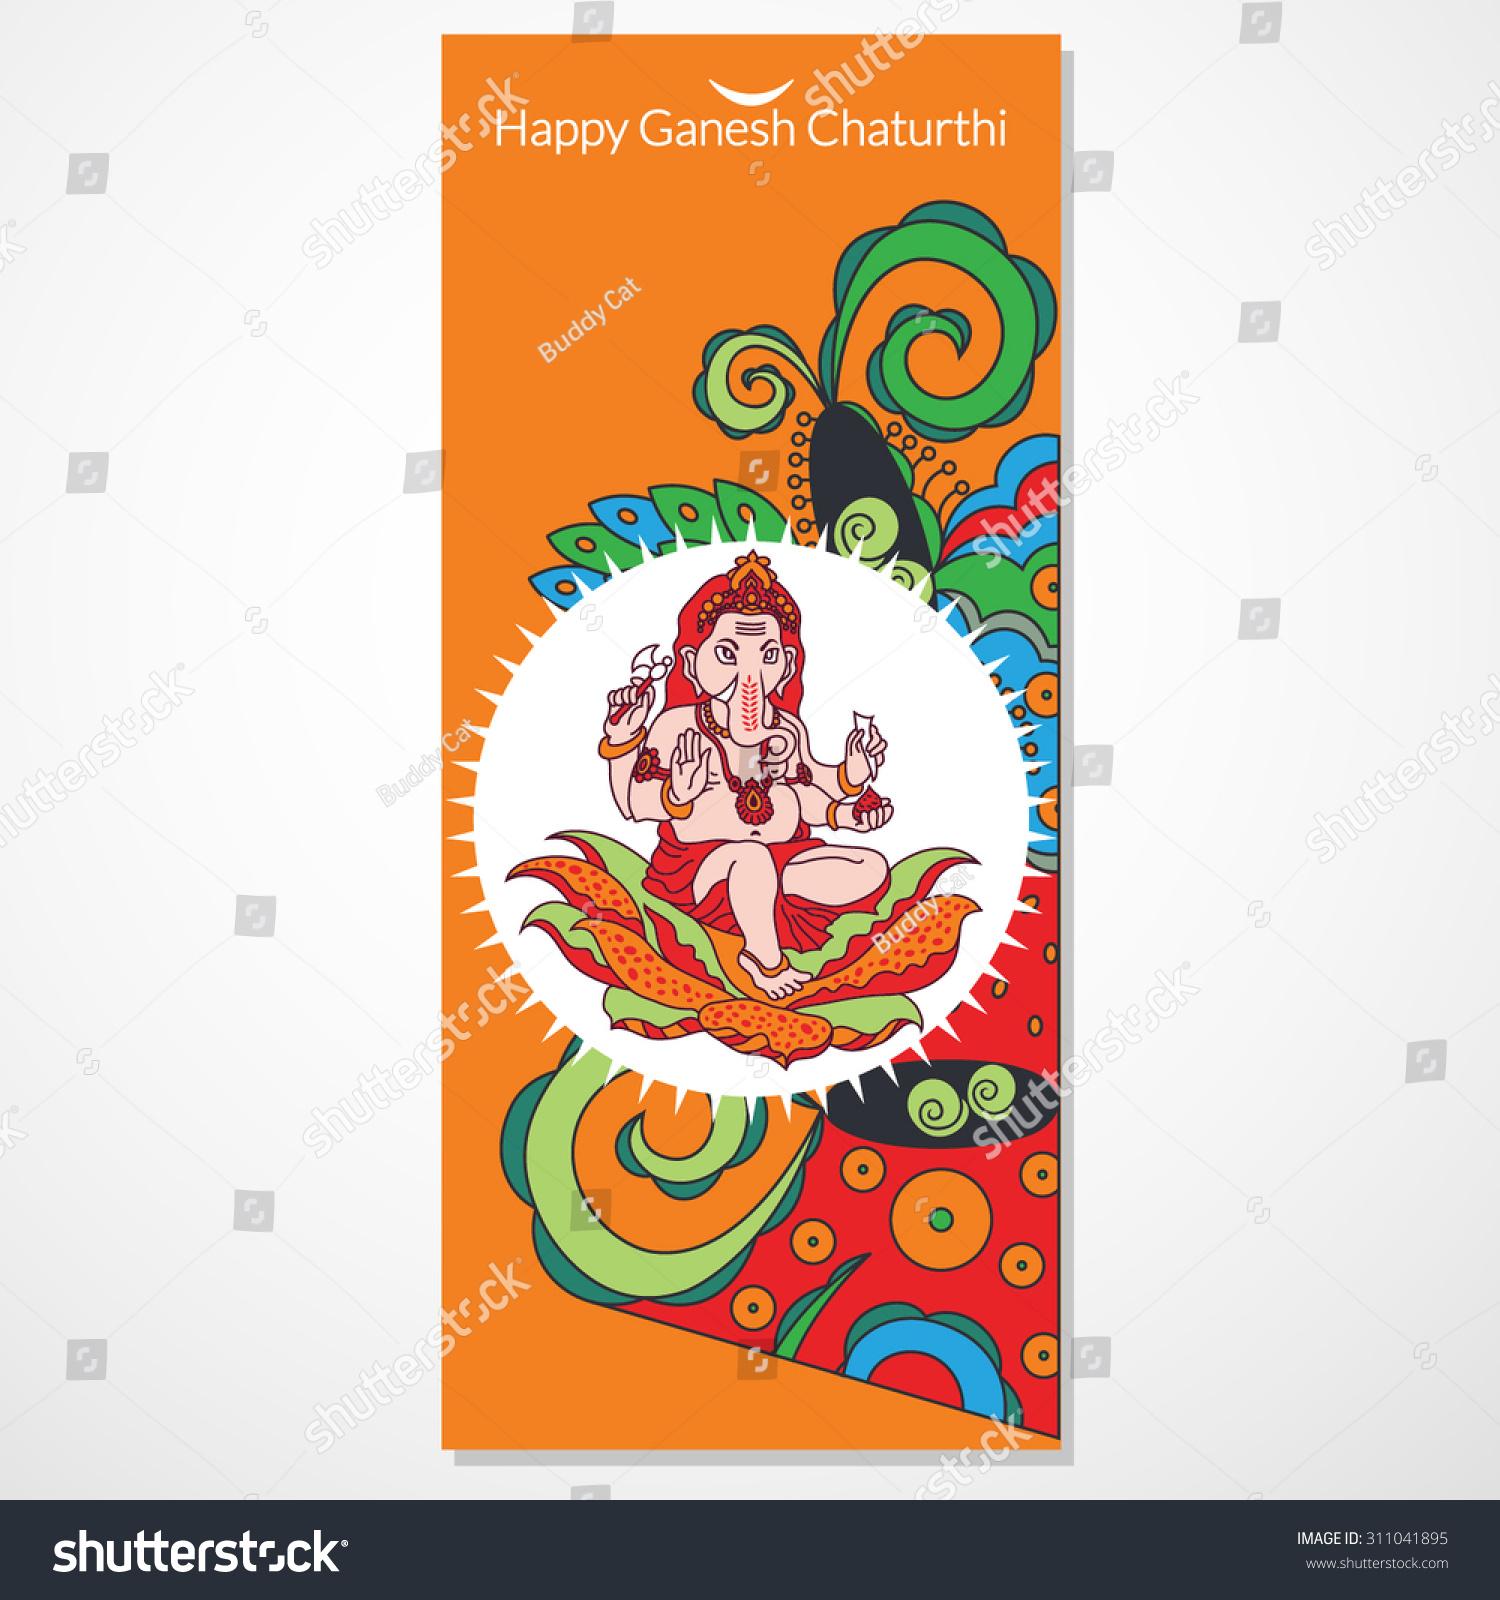 Creative Ganesh Chaturthi Festival Greeting Card Stock Vector 2018